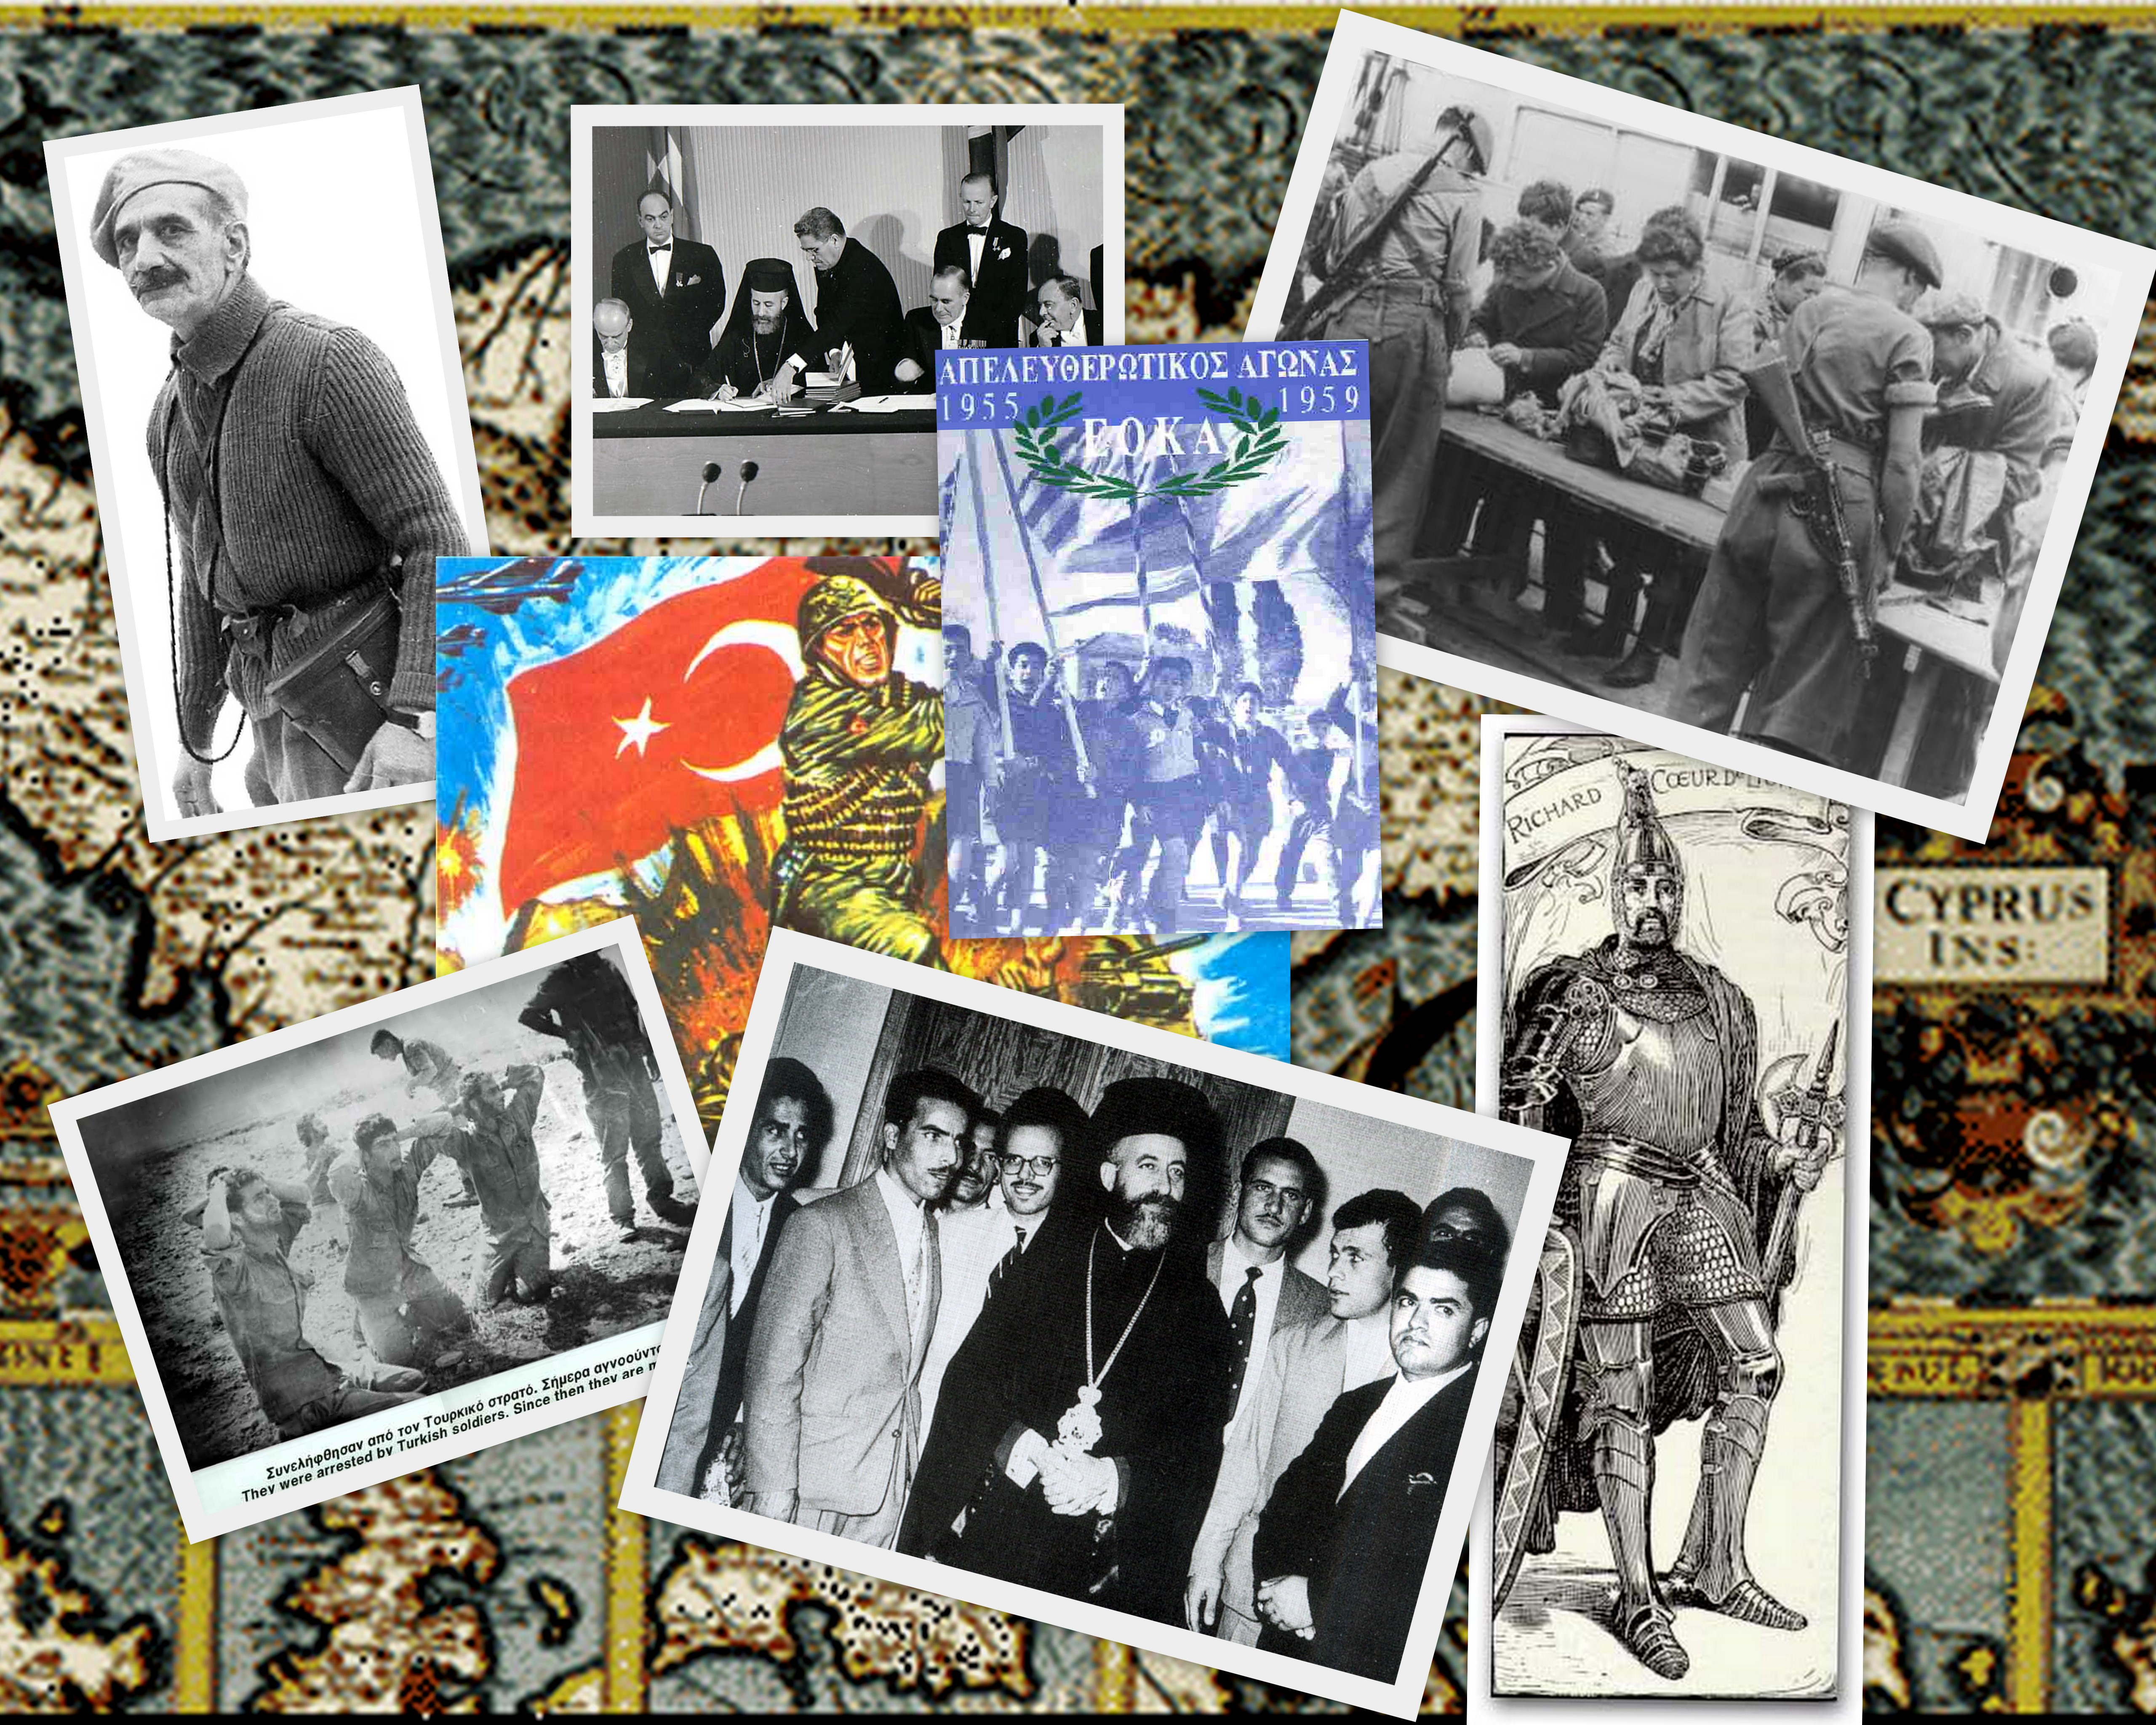 history of Cyprus